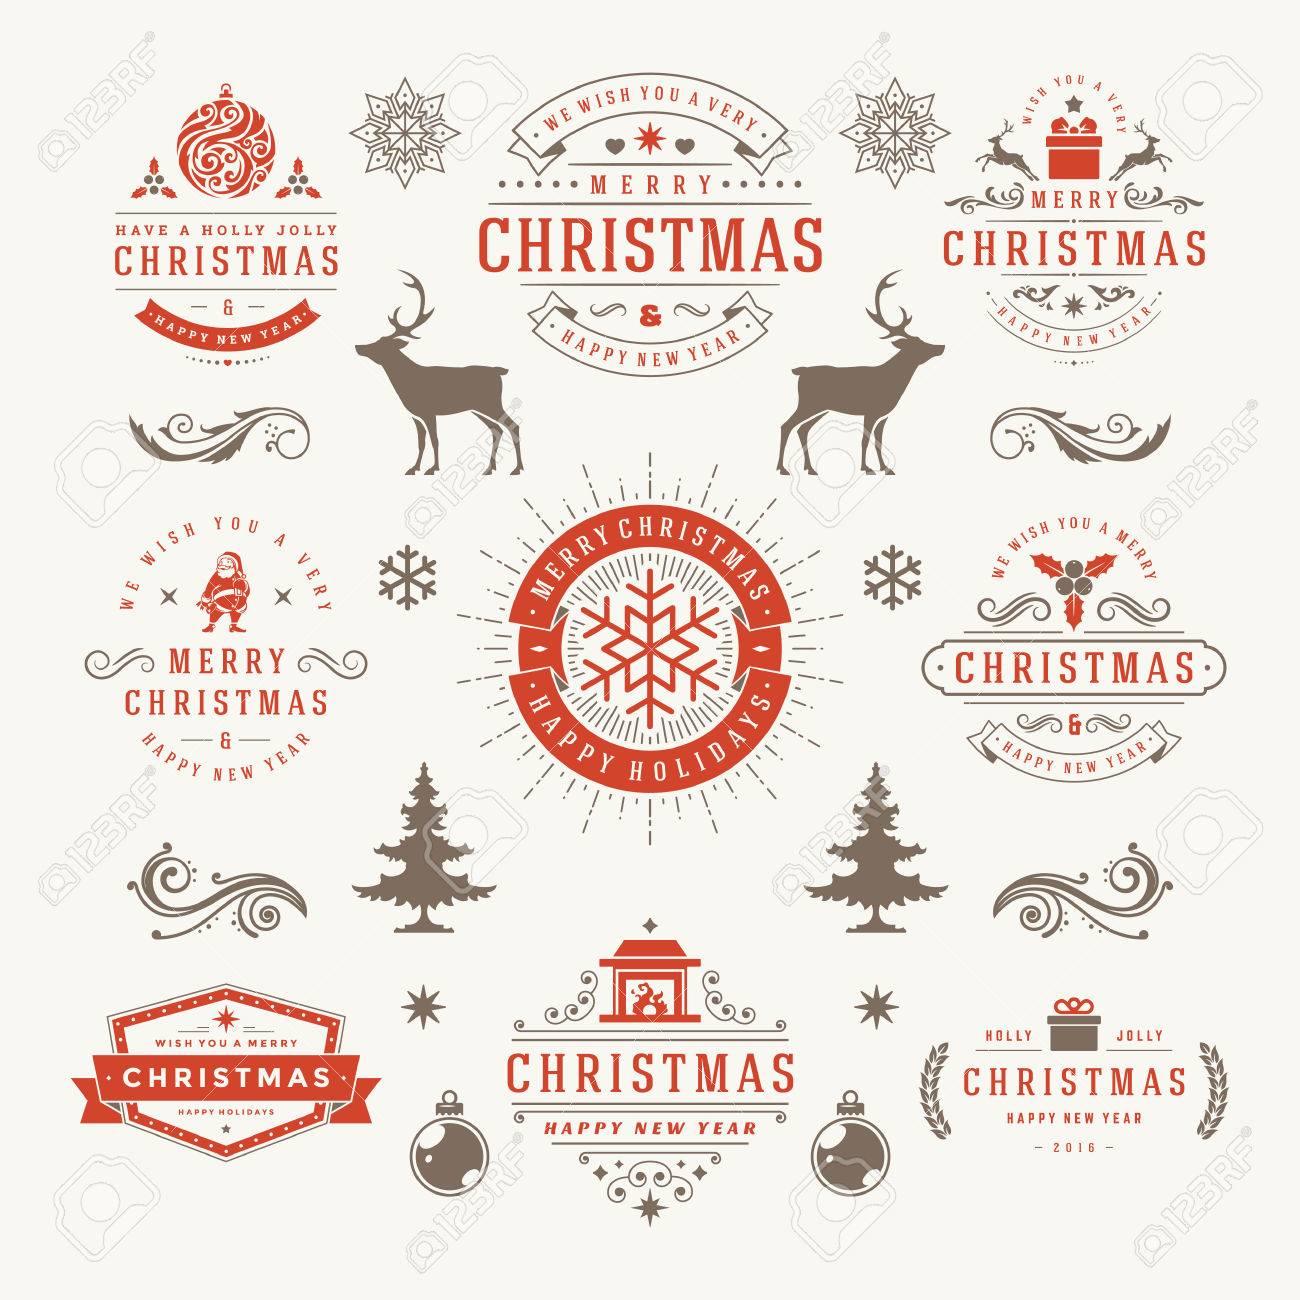 Etiketten Frohe Weihnachten.Stock Photo